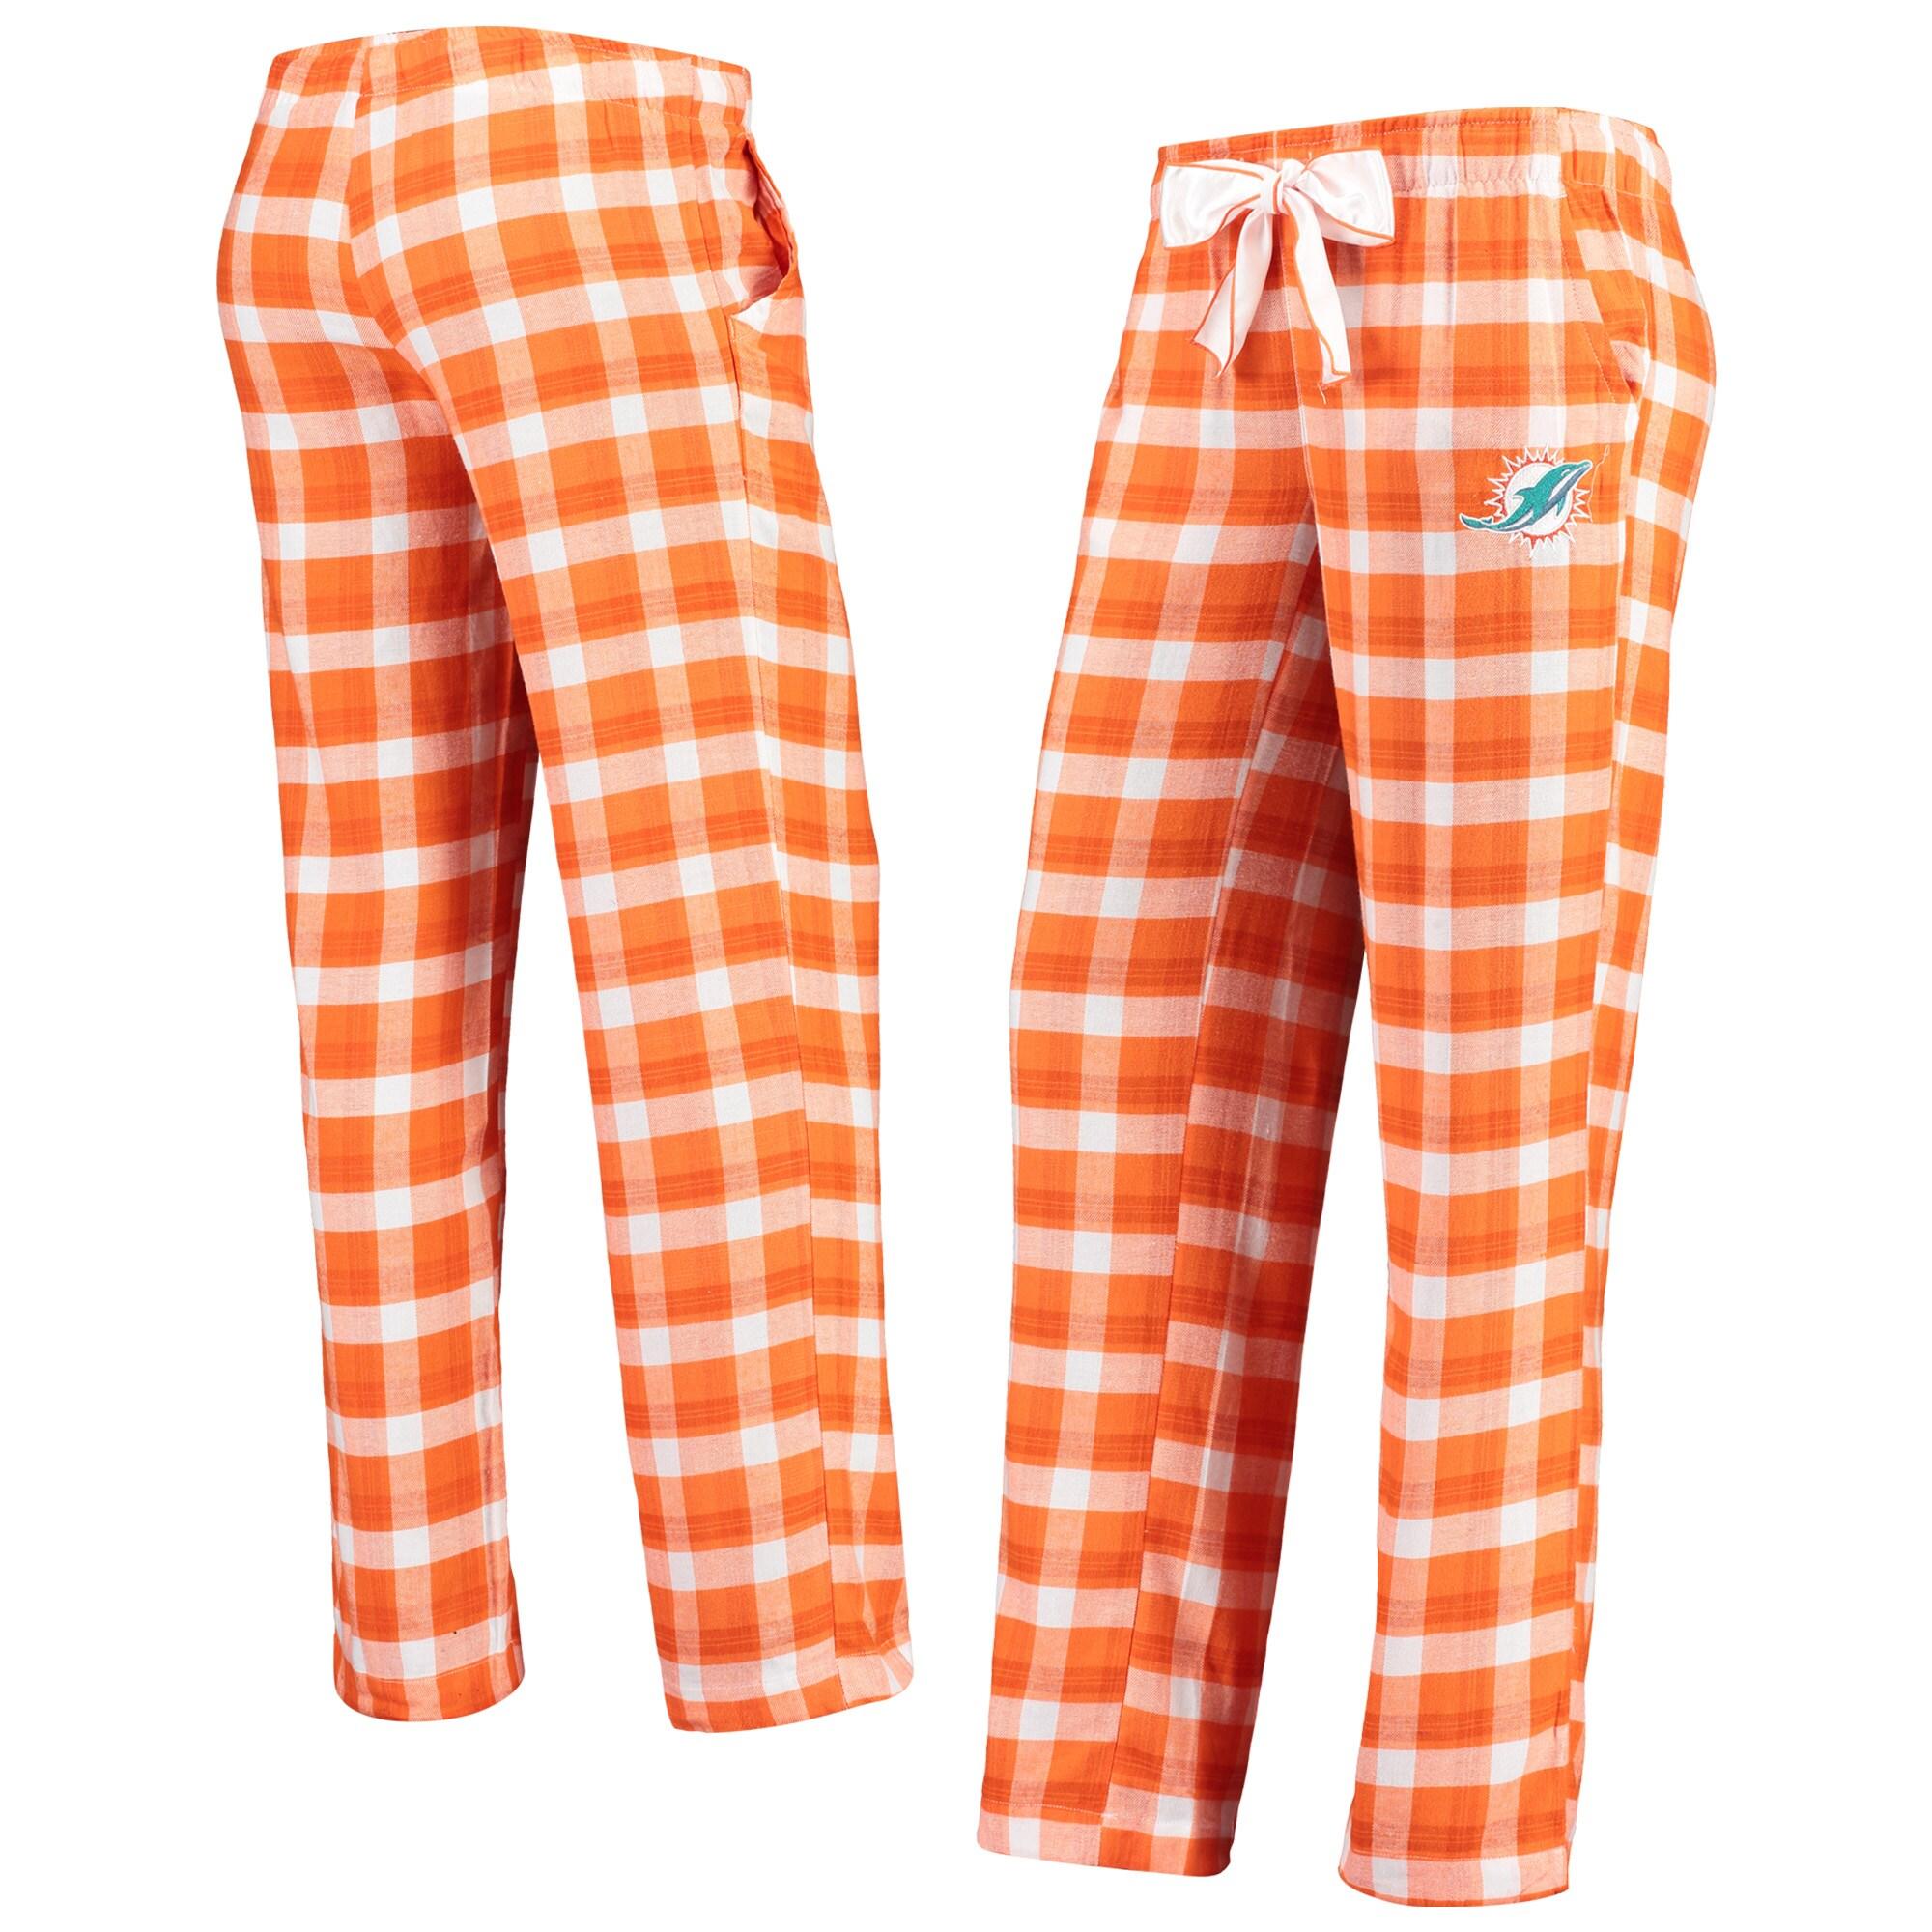 Miami Dolphins Concepts Sport Women's Piedmont Flannel Sleep Pants - Orange/White